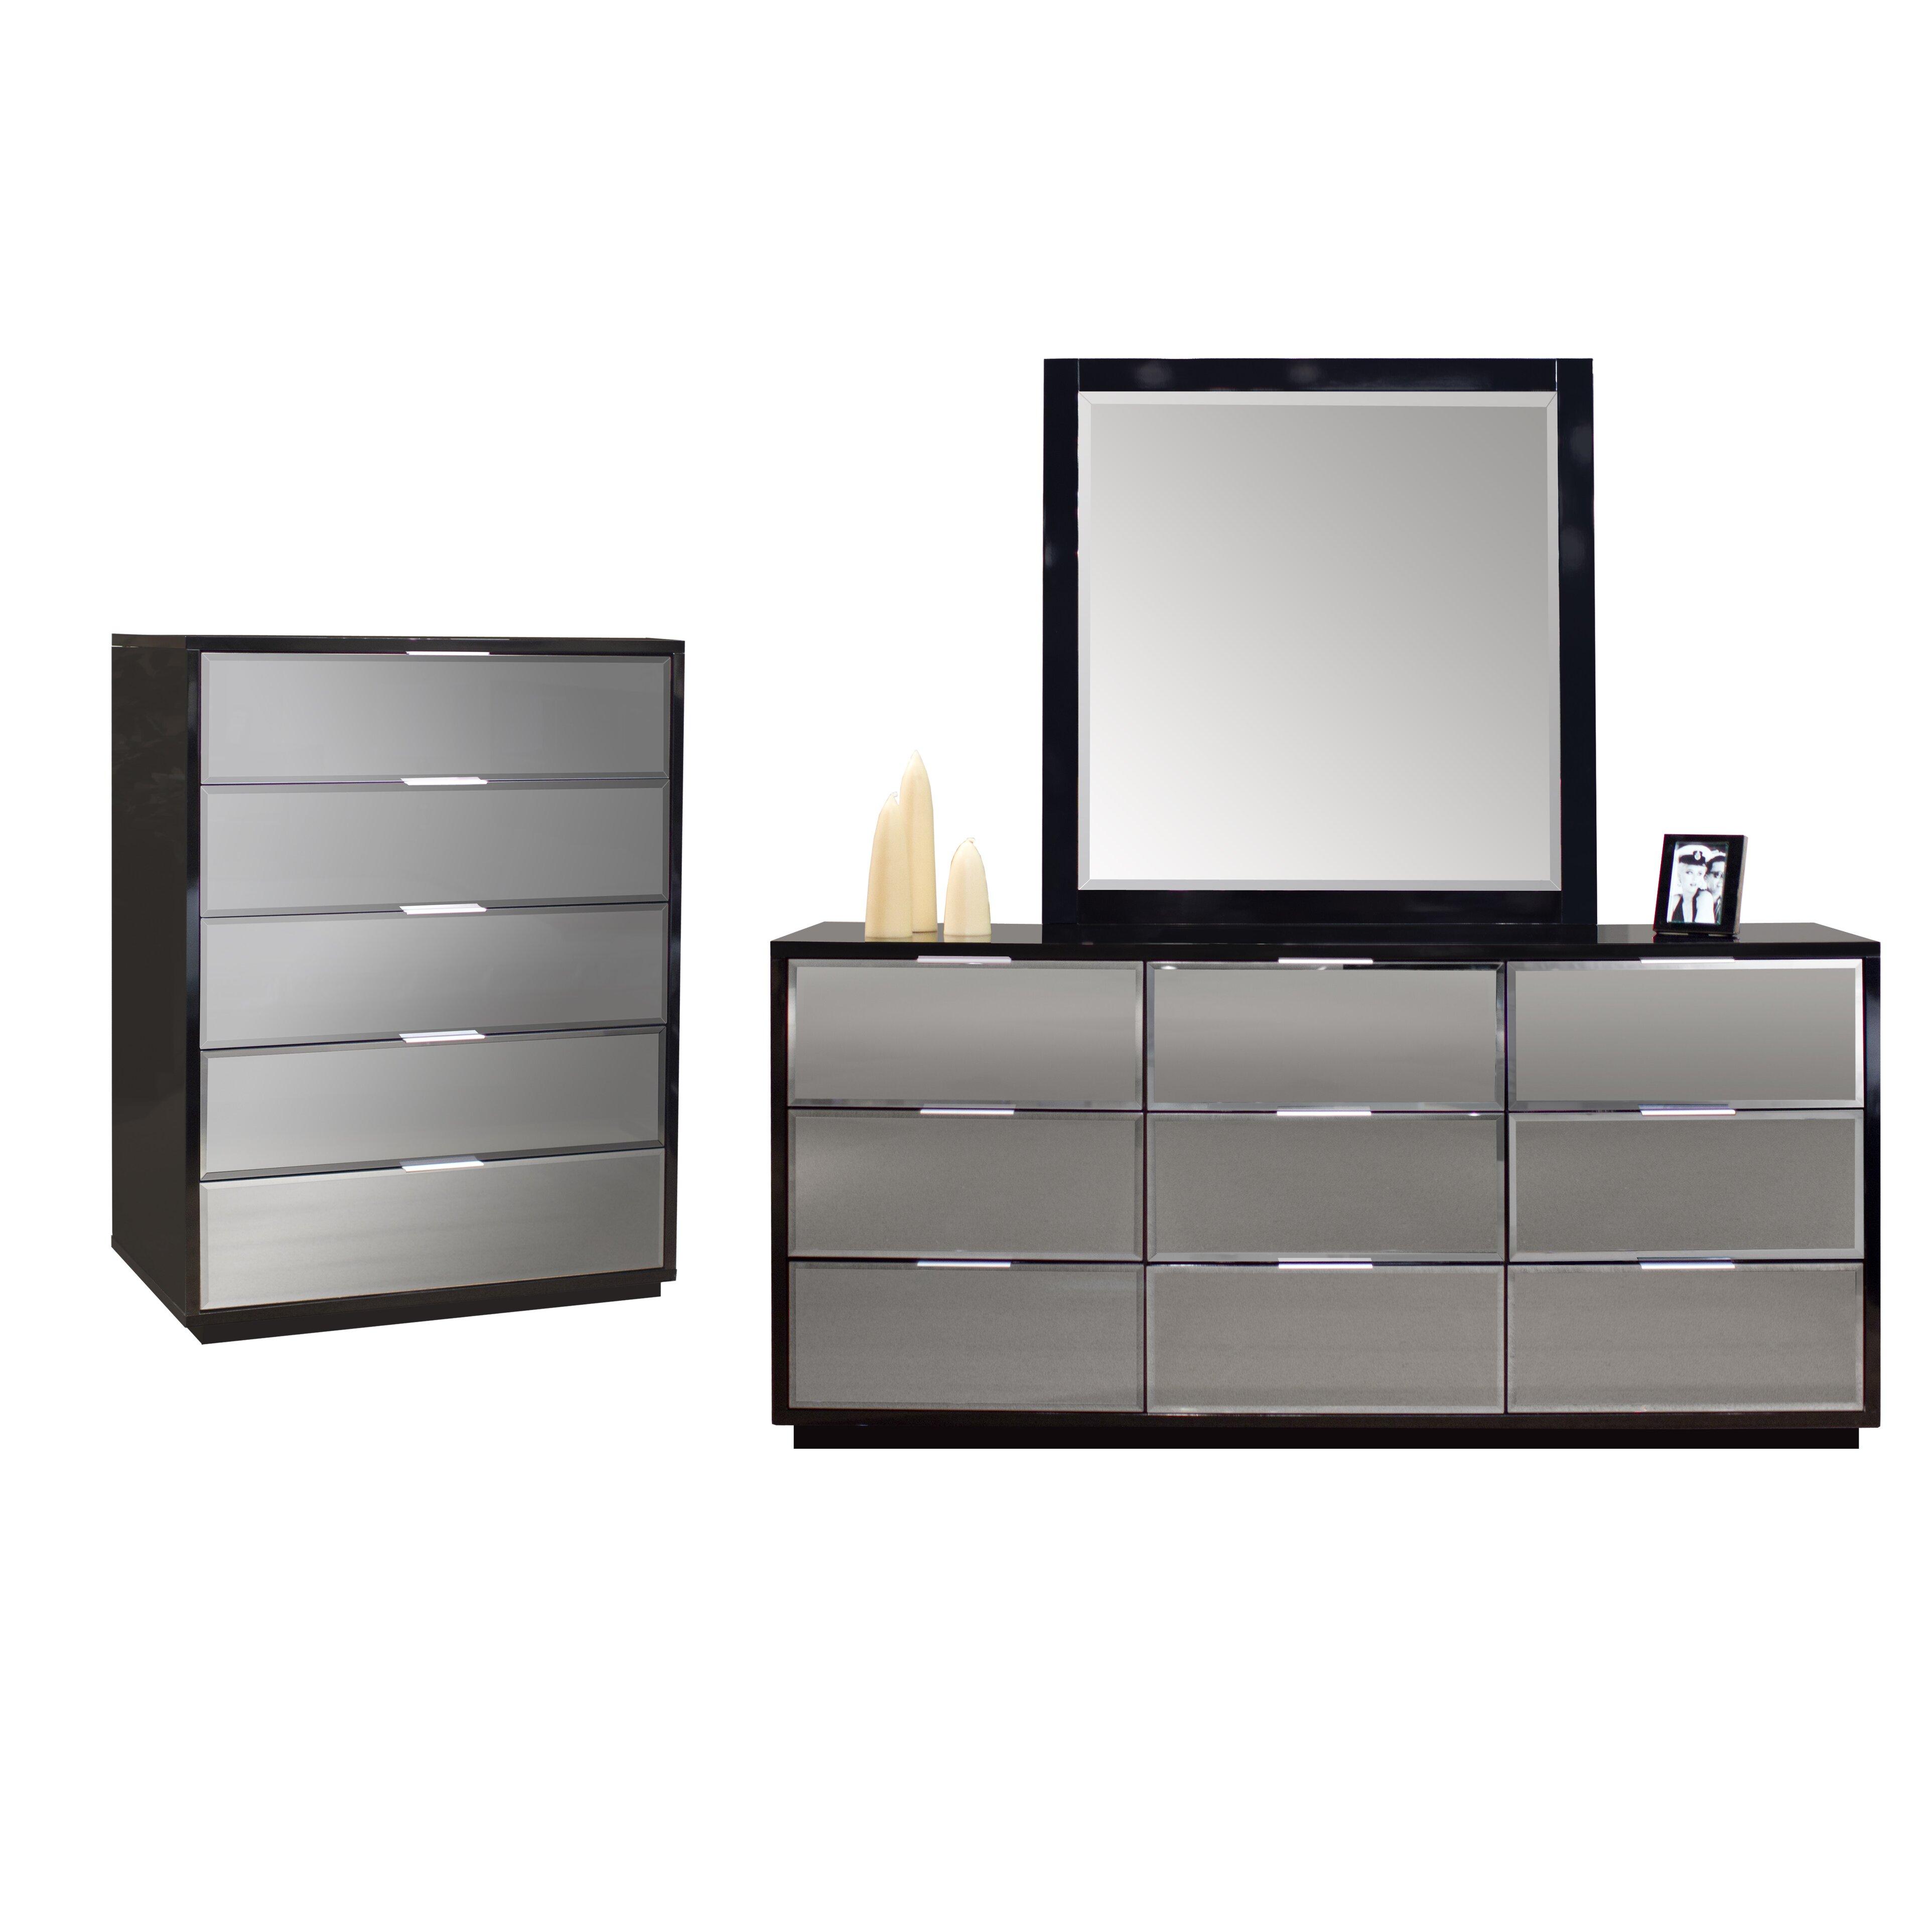 sharelle furnishings - sharelle furnishings